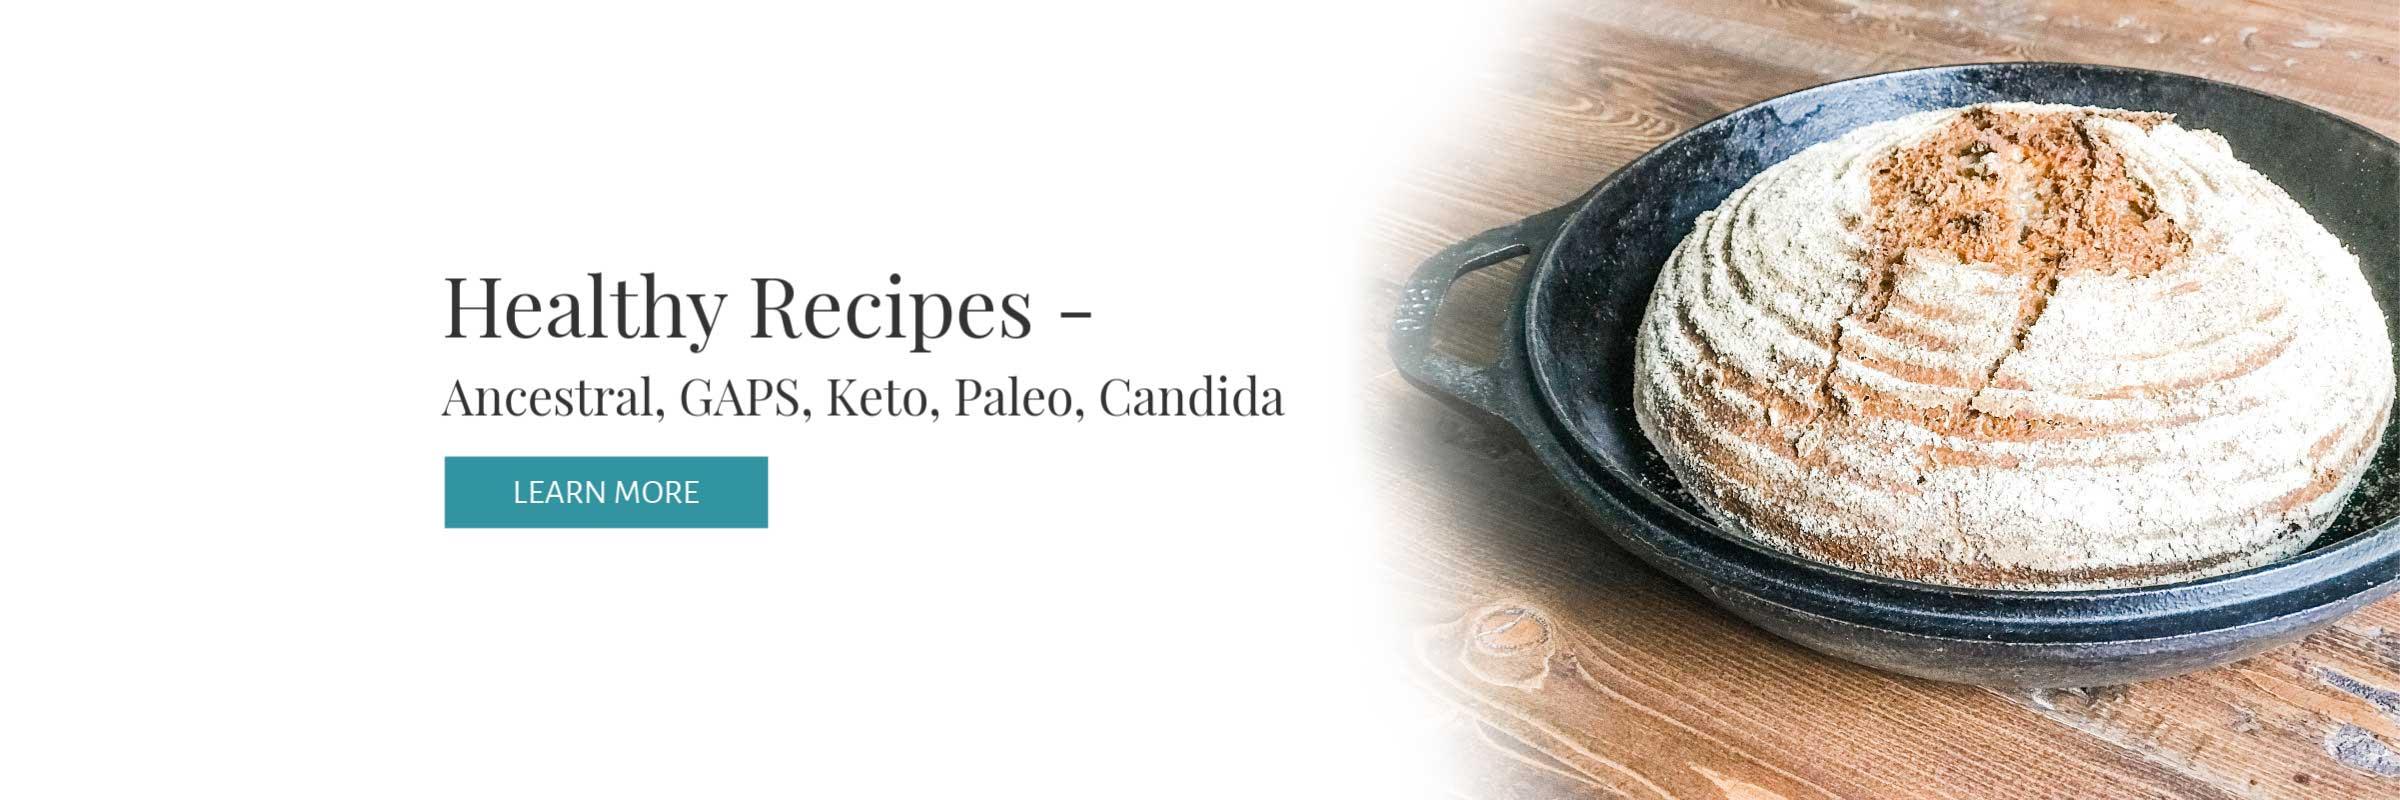 Well Made Wellness healthy recipes for Ancestral, GAPS, Keto, Paleo, Candida